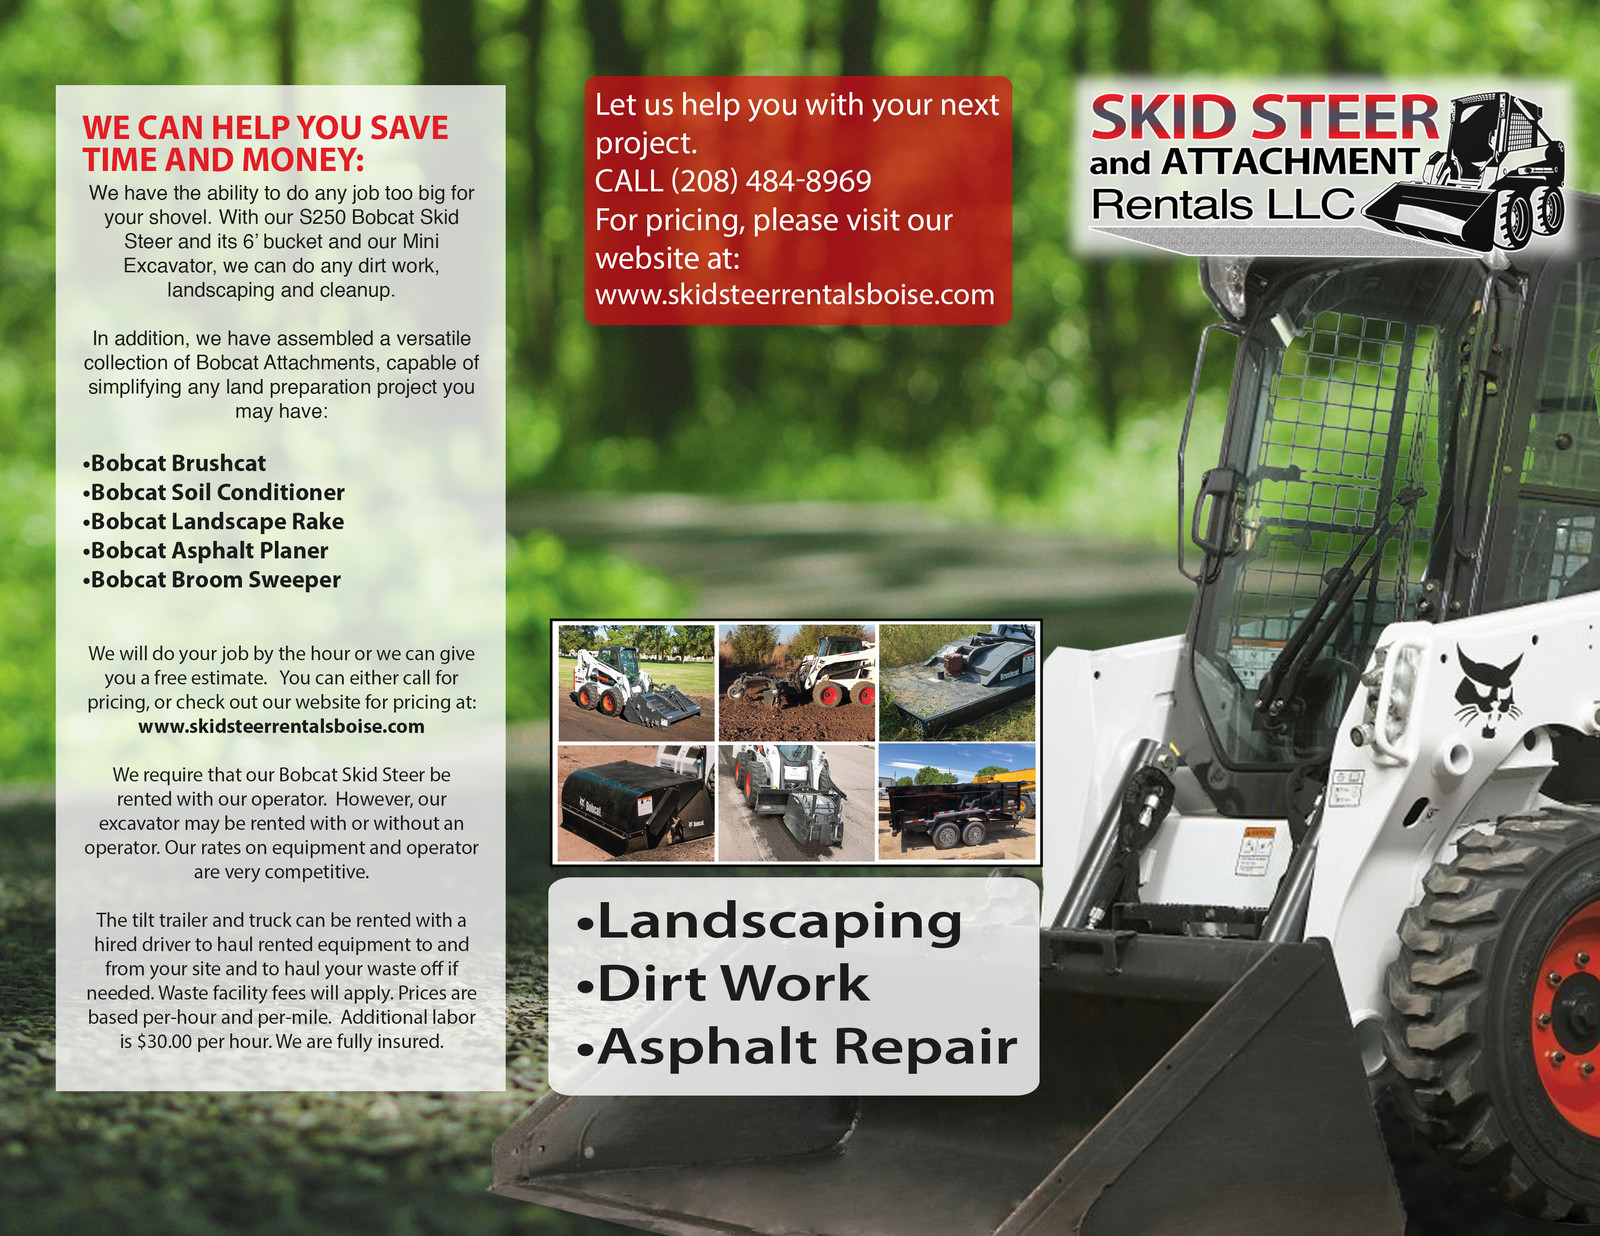 Skid Steer Soil Conditioner For Rent